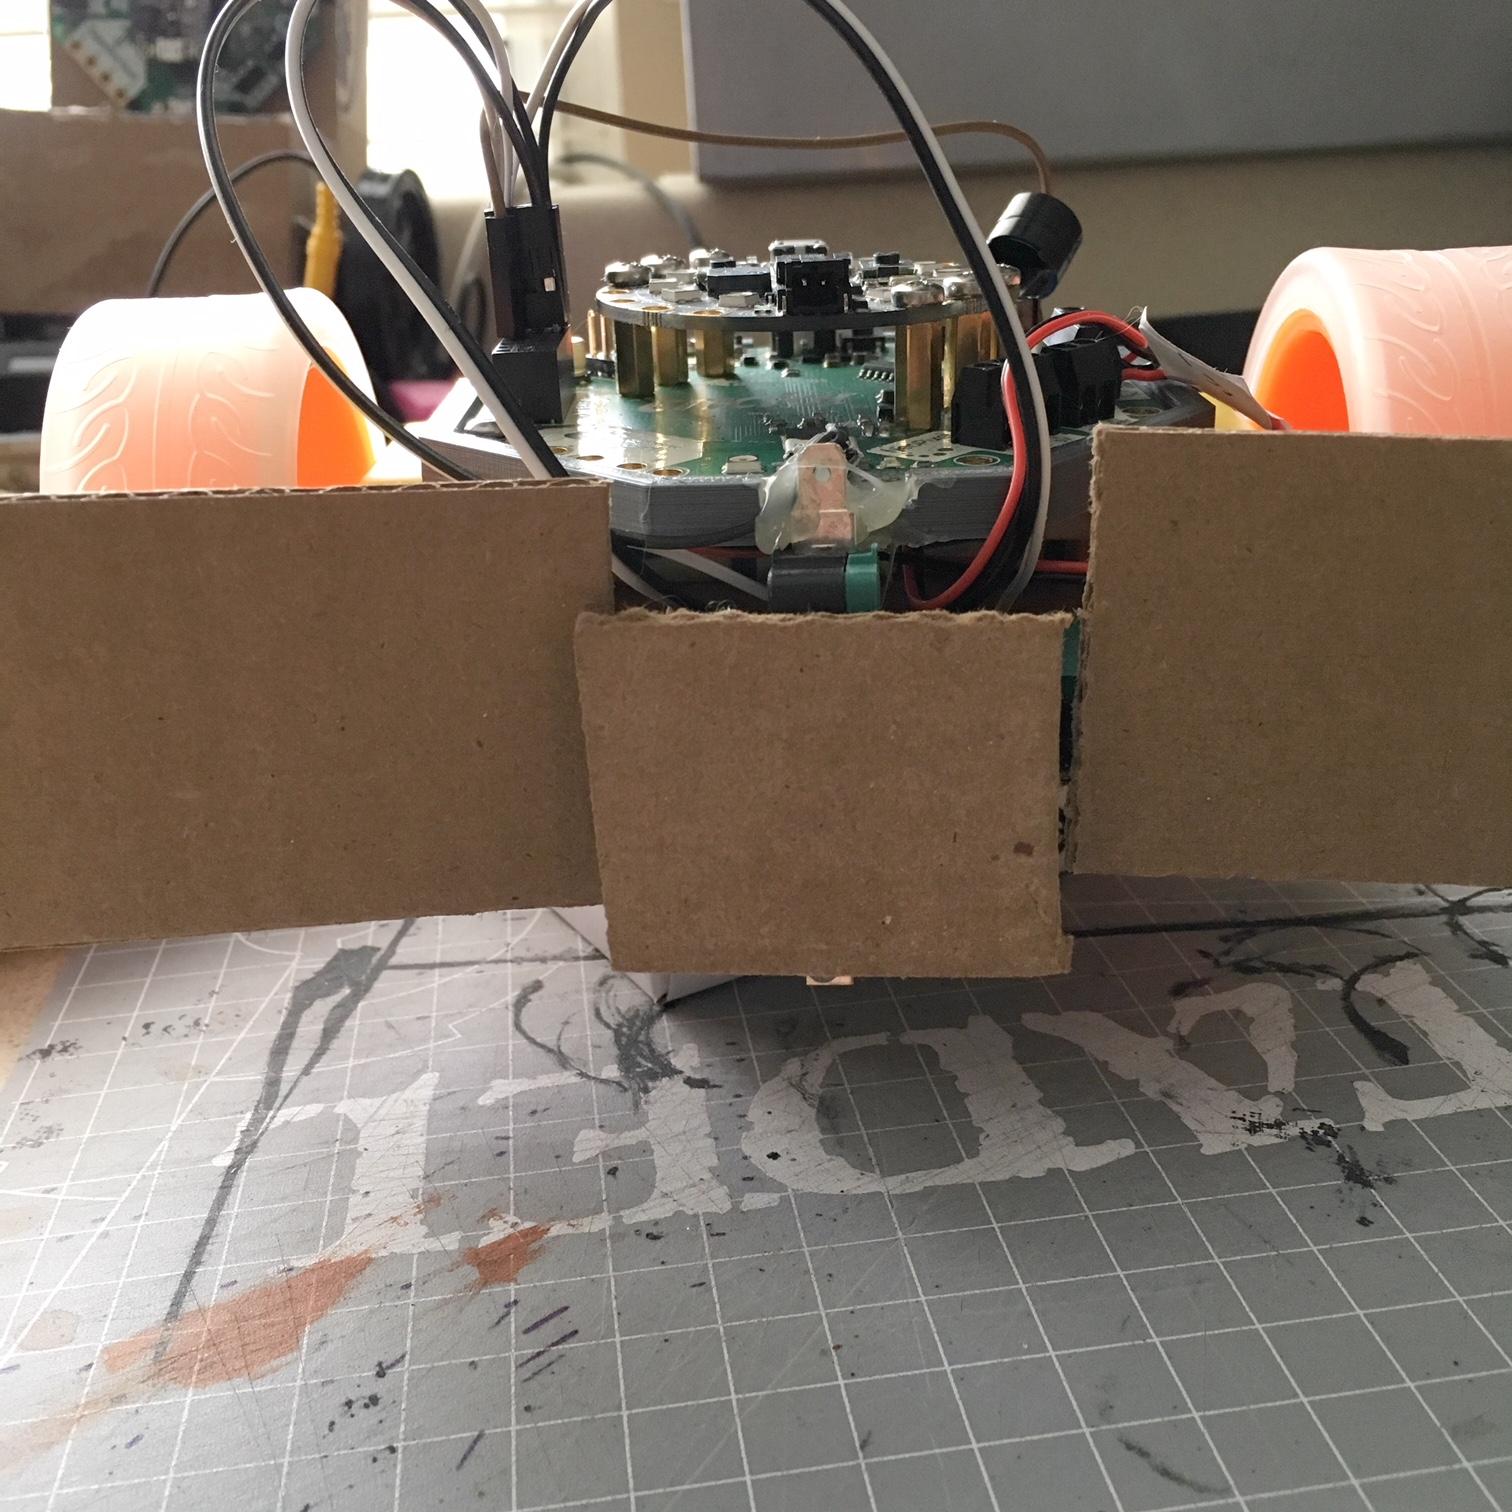 robotics___cnc_IMG_2182.jpg